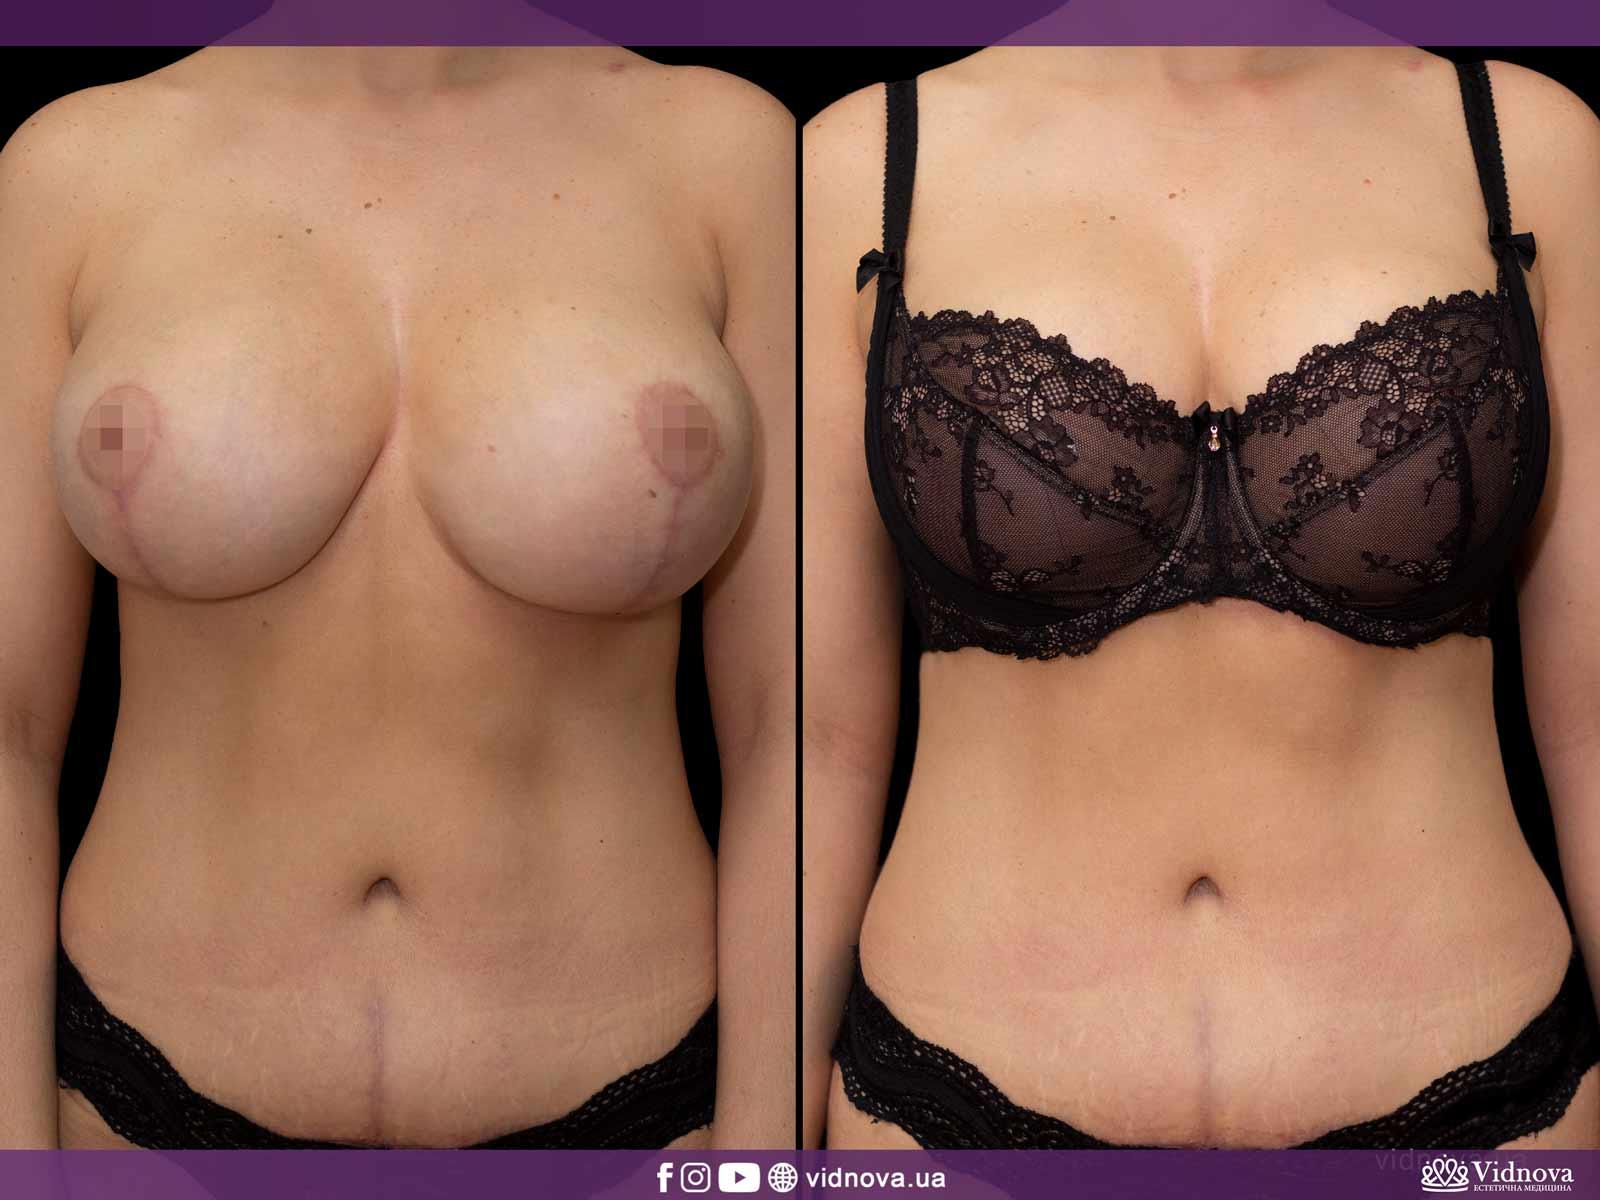 Подтяжка груди: Фото ДО и ПОСЛЕ - Пример №10-1 - Клиника Vidnova